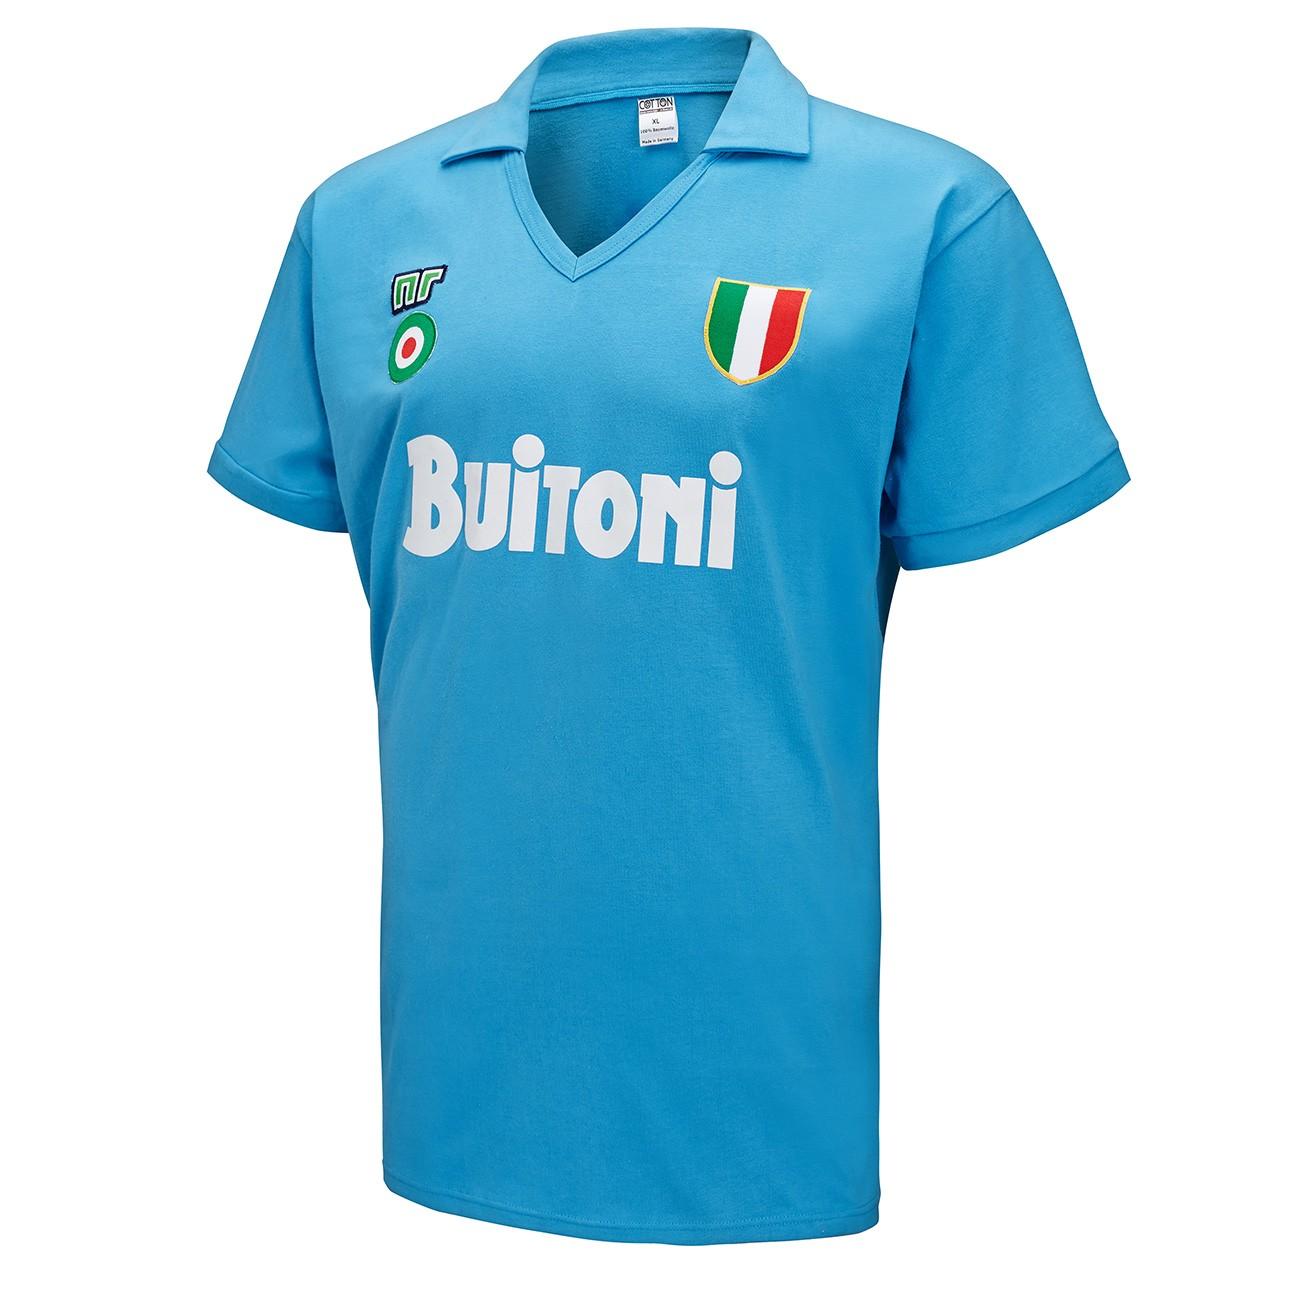 http://www.retrofootball.es/ropa-de-futbol/camiseta-ssc-napoli-1987-88.html